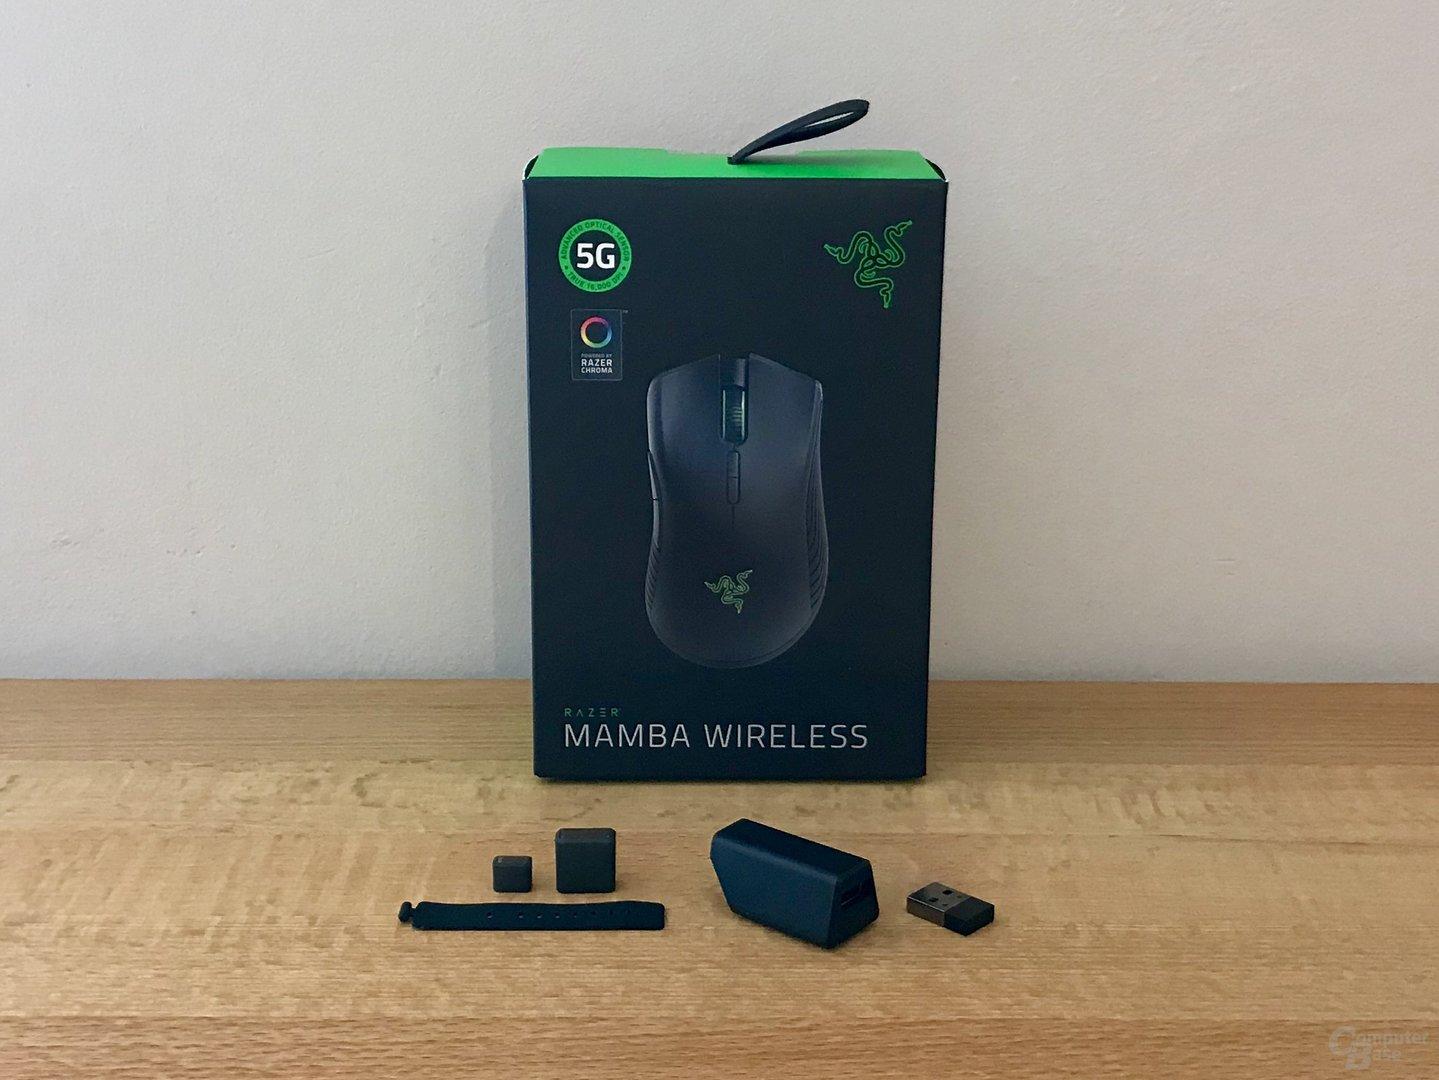 Lieferumfang der Mamba Wireless